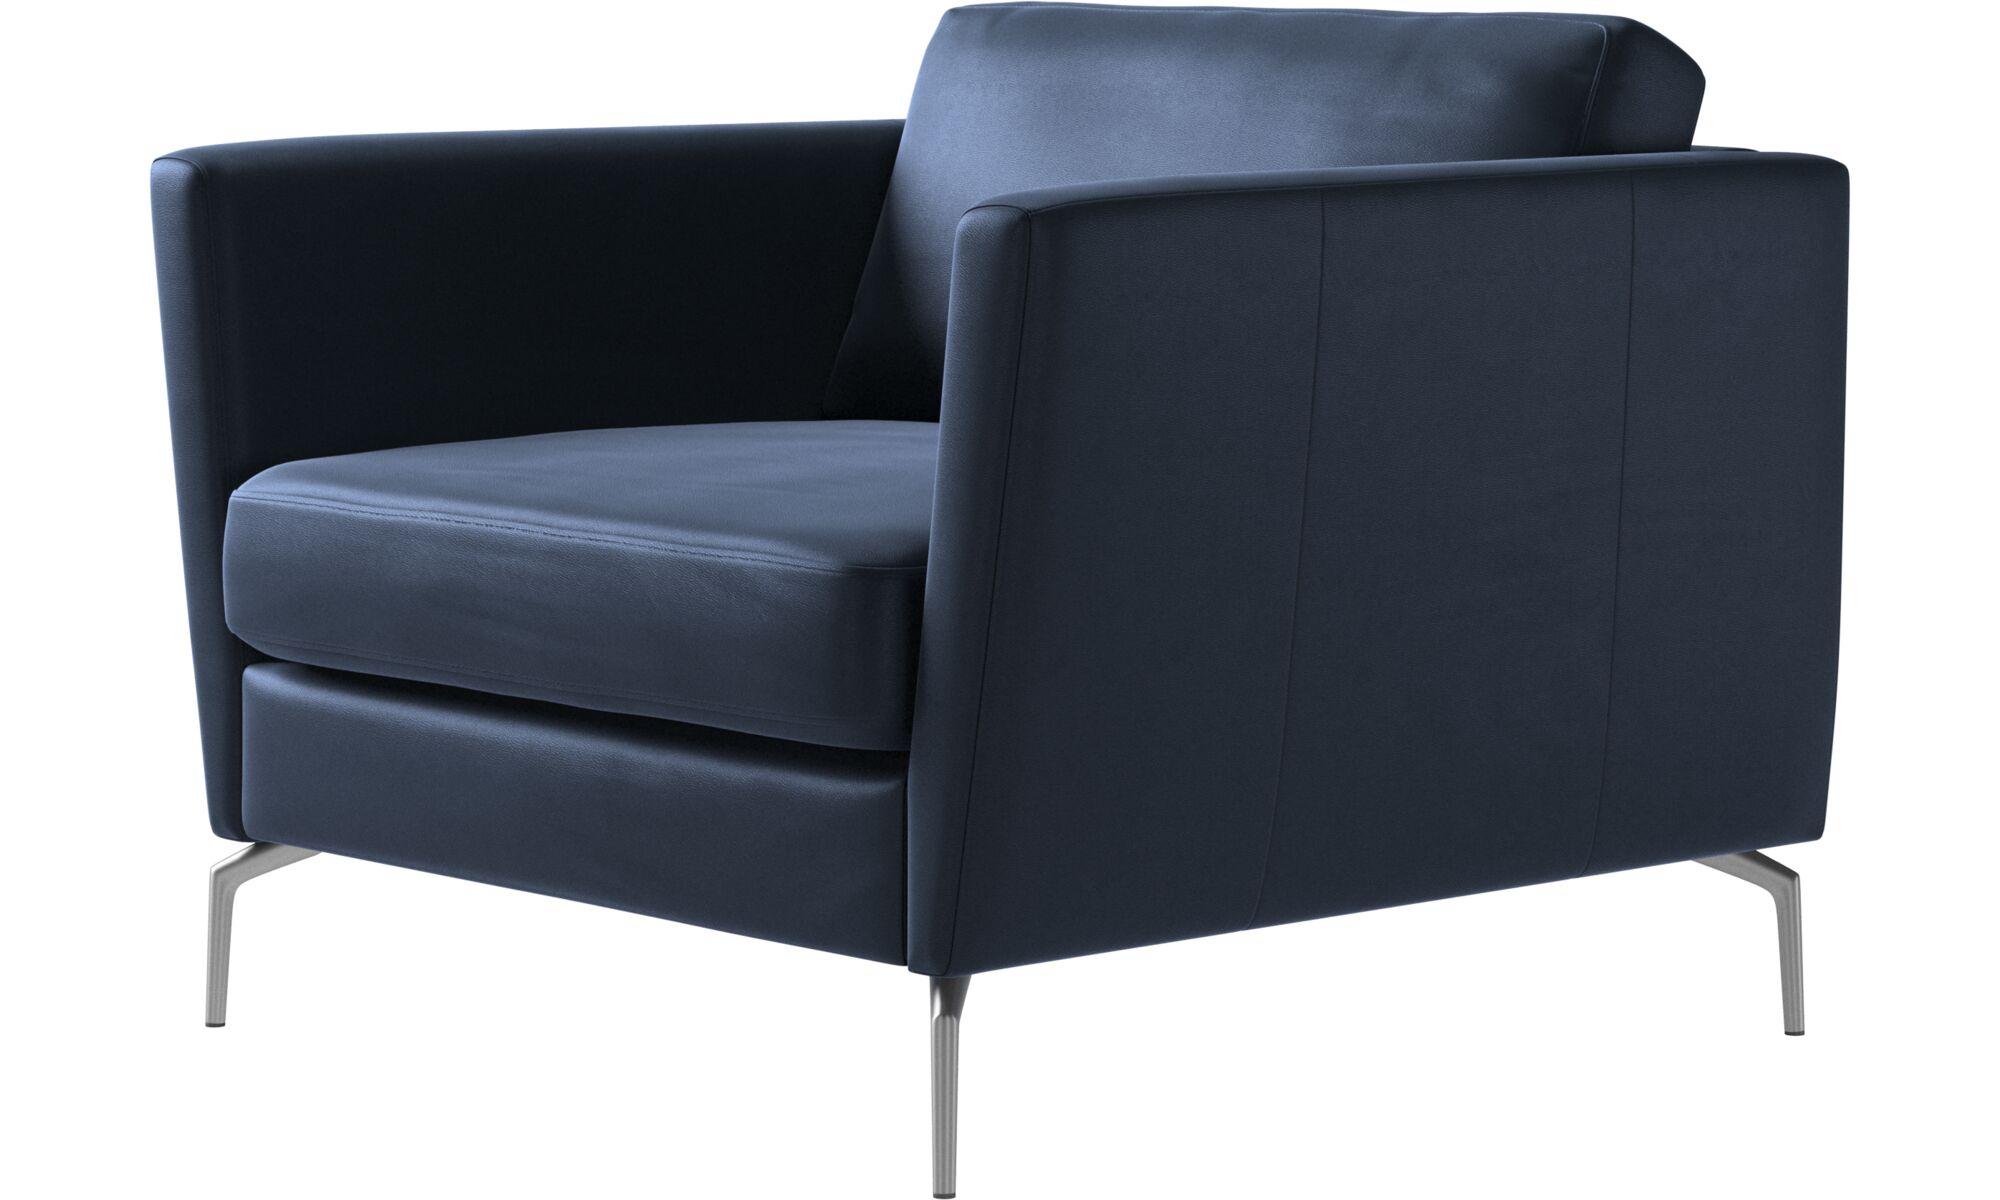 Armchairs - Osaka chair, regular seat - Blue - Leather